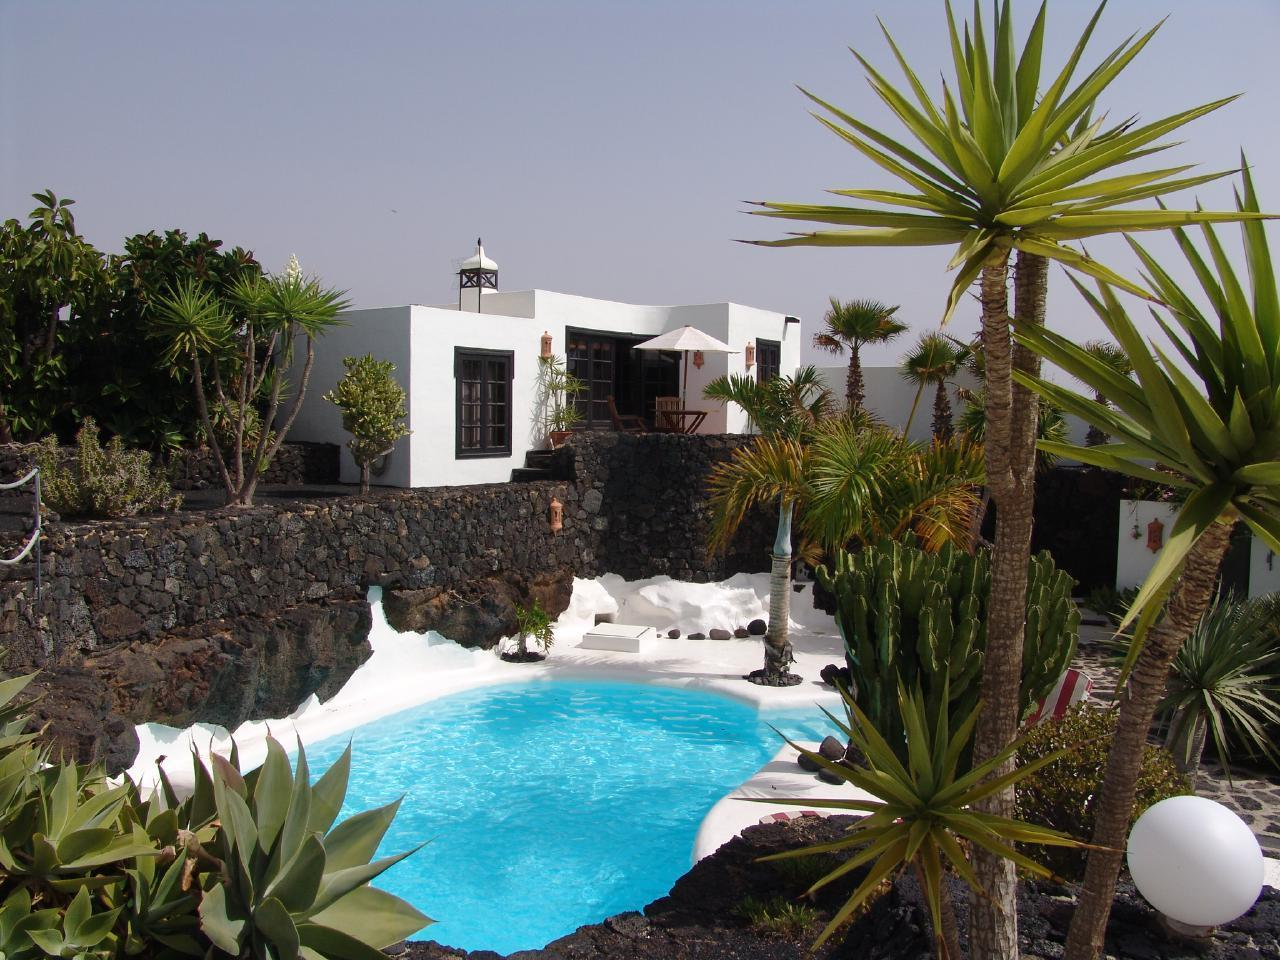 Holiday house CASA TEIGA ESTRELLA 3 Schlafzimmern VILLA MIT POOL (1682021), Tahiche, Lanzarote, Canary Islands, Spain, picture 6